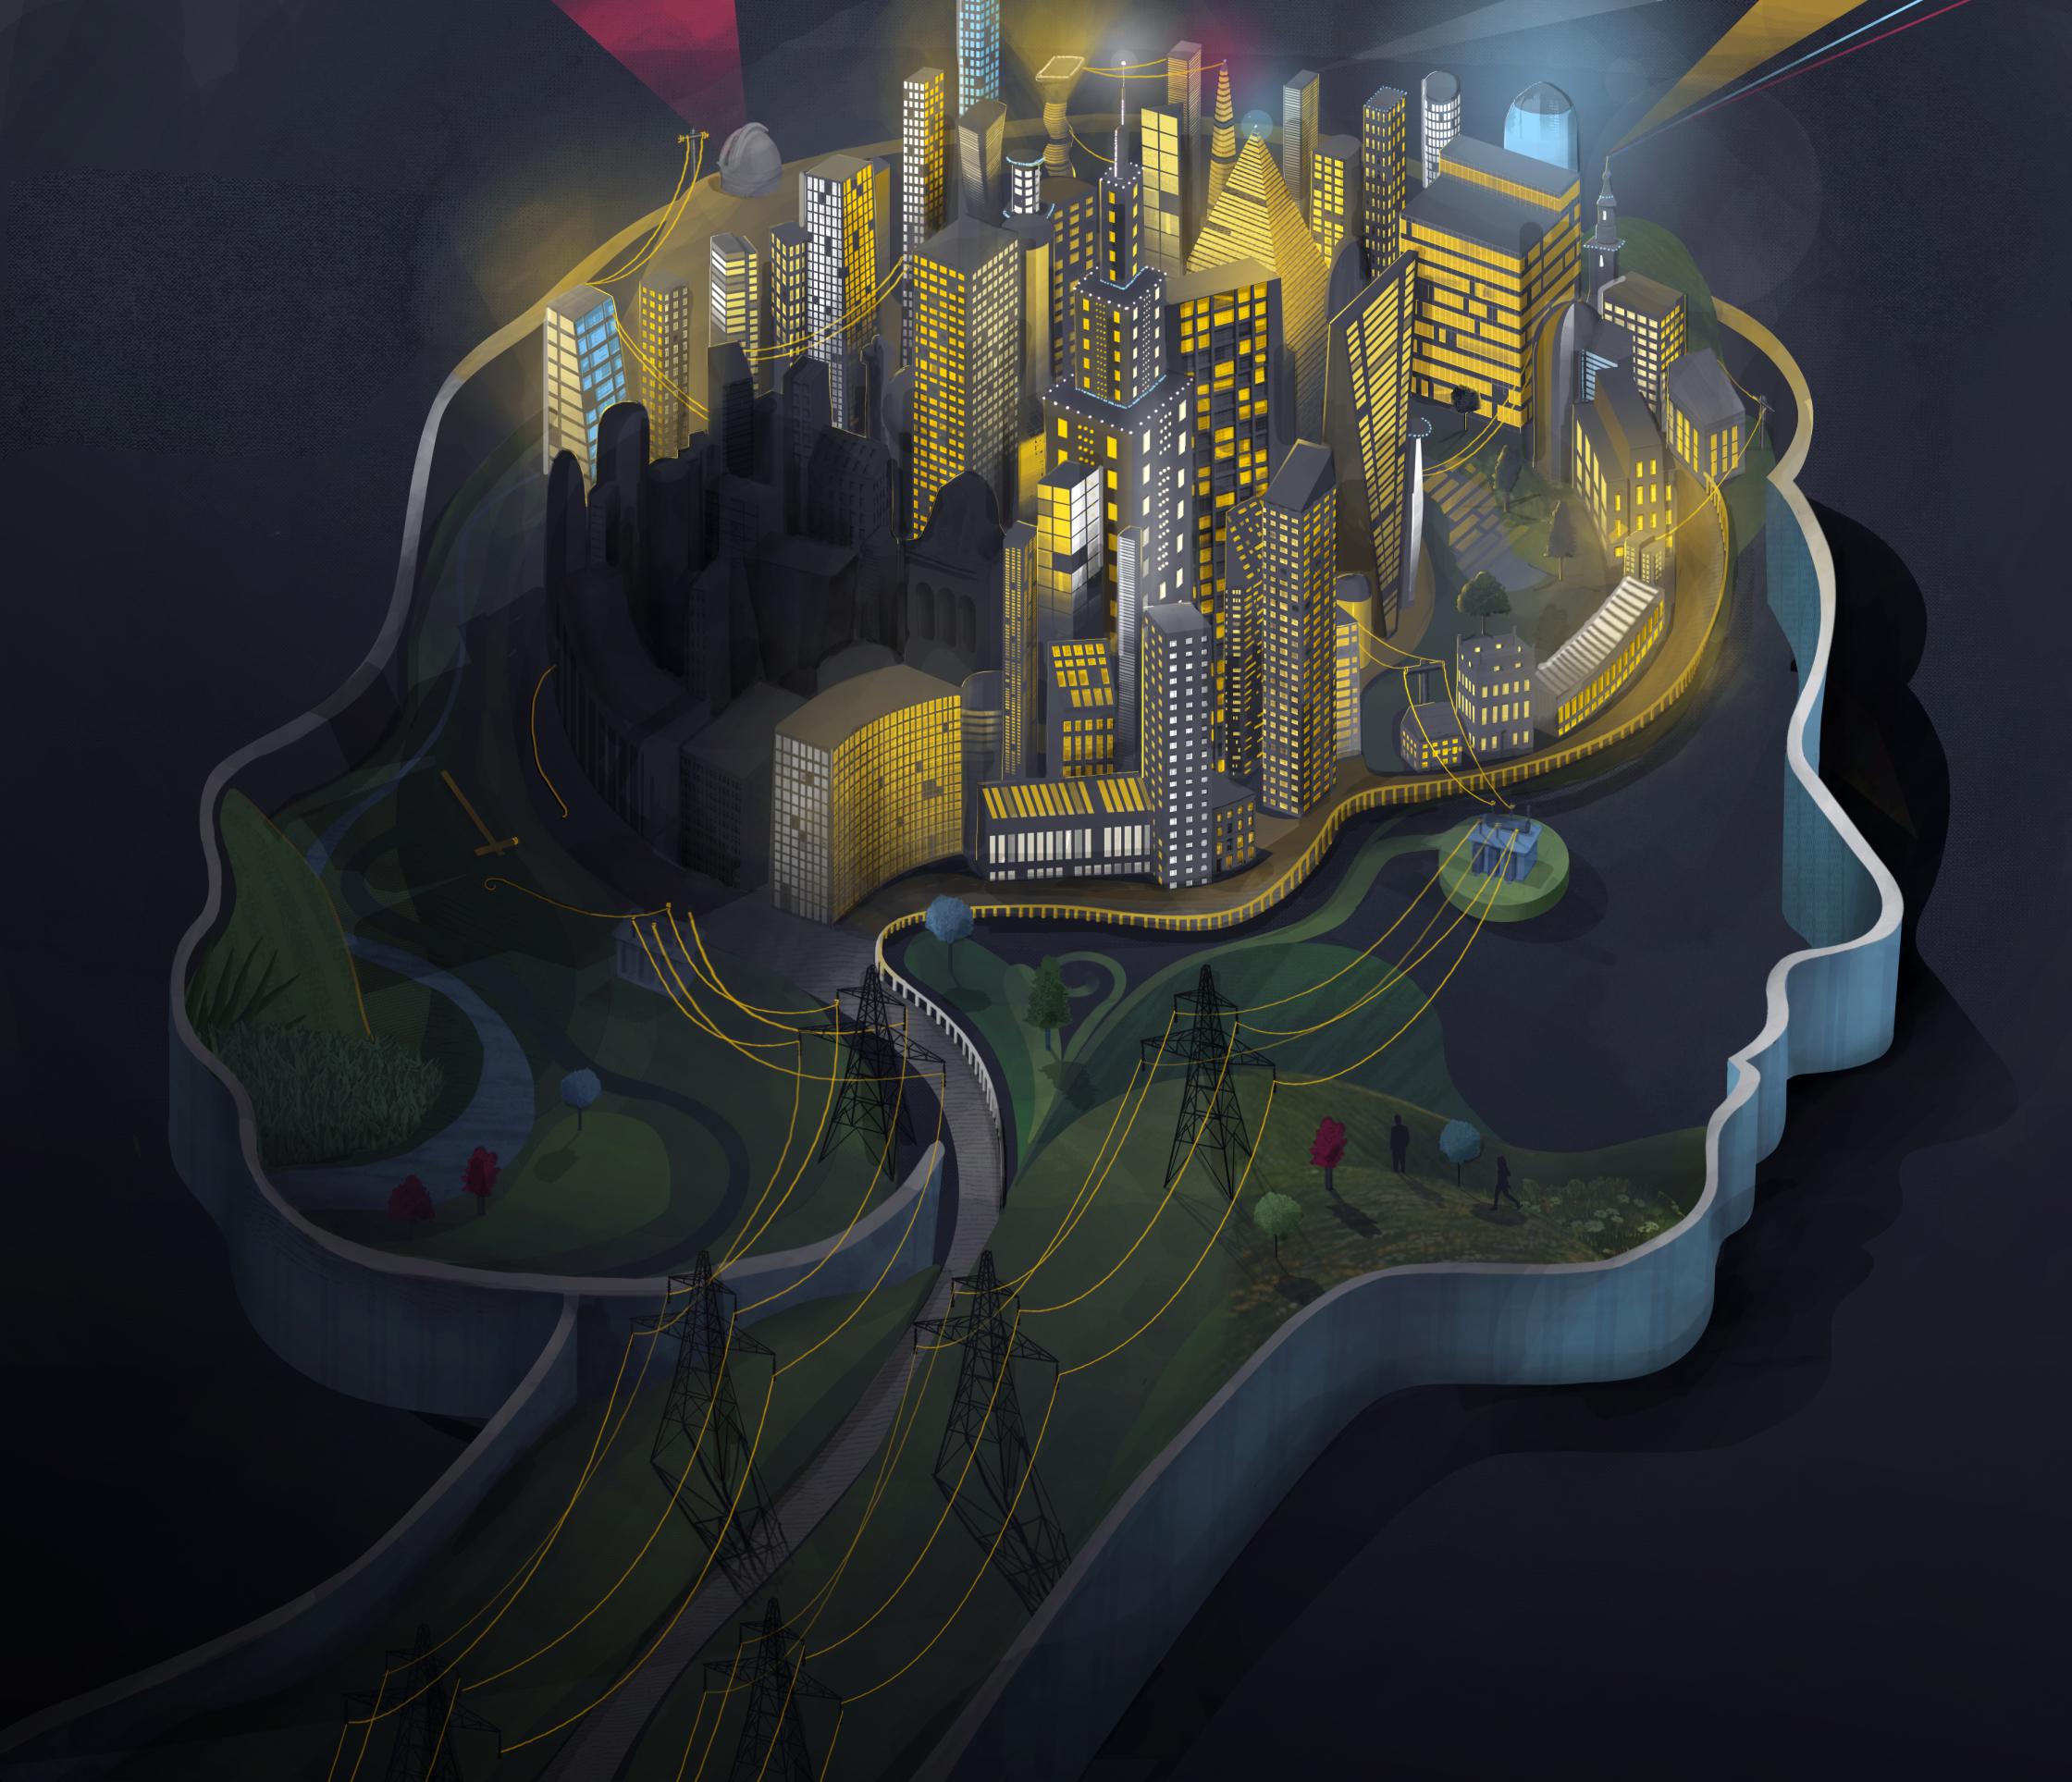 Brain Boosting / New Scientist